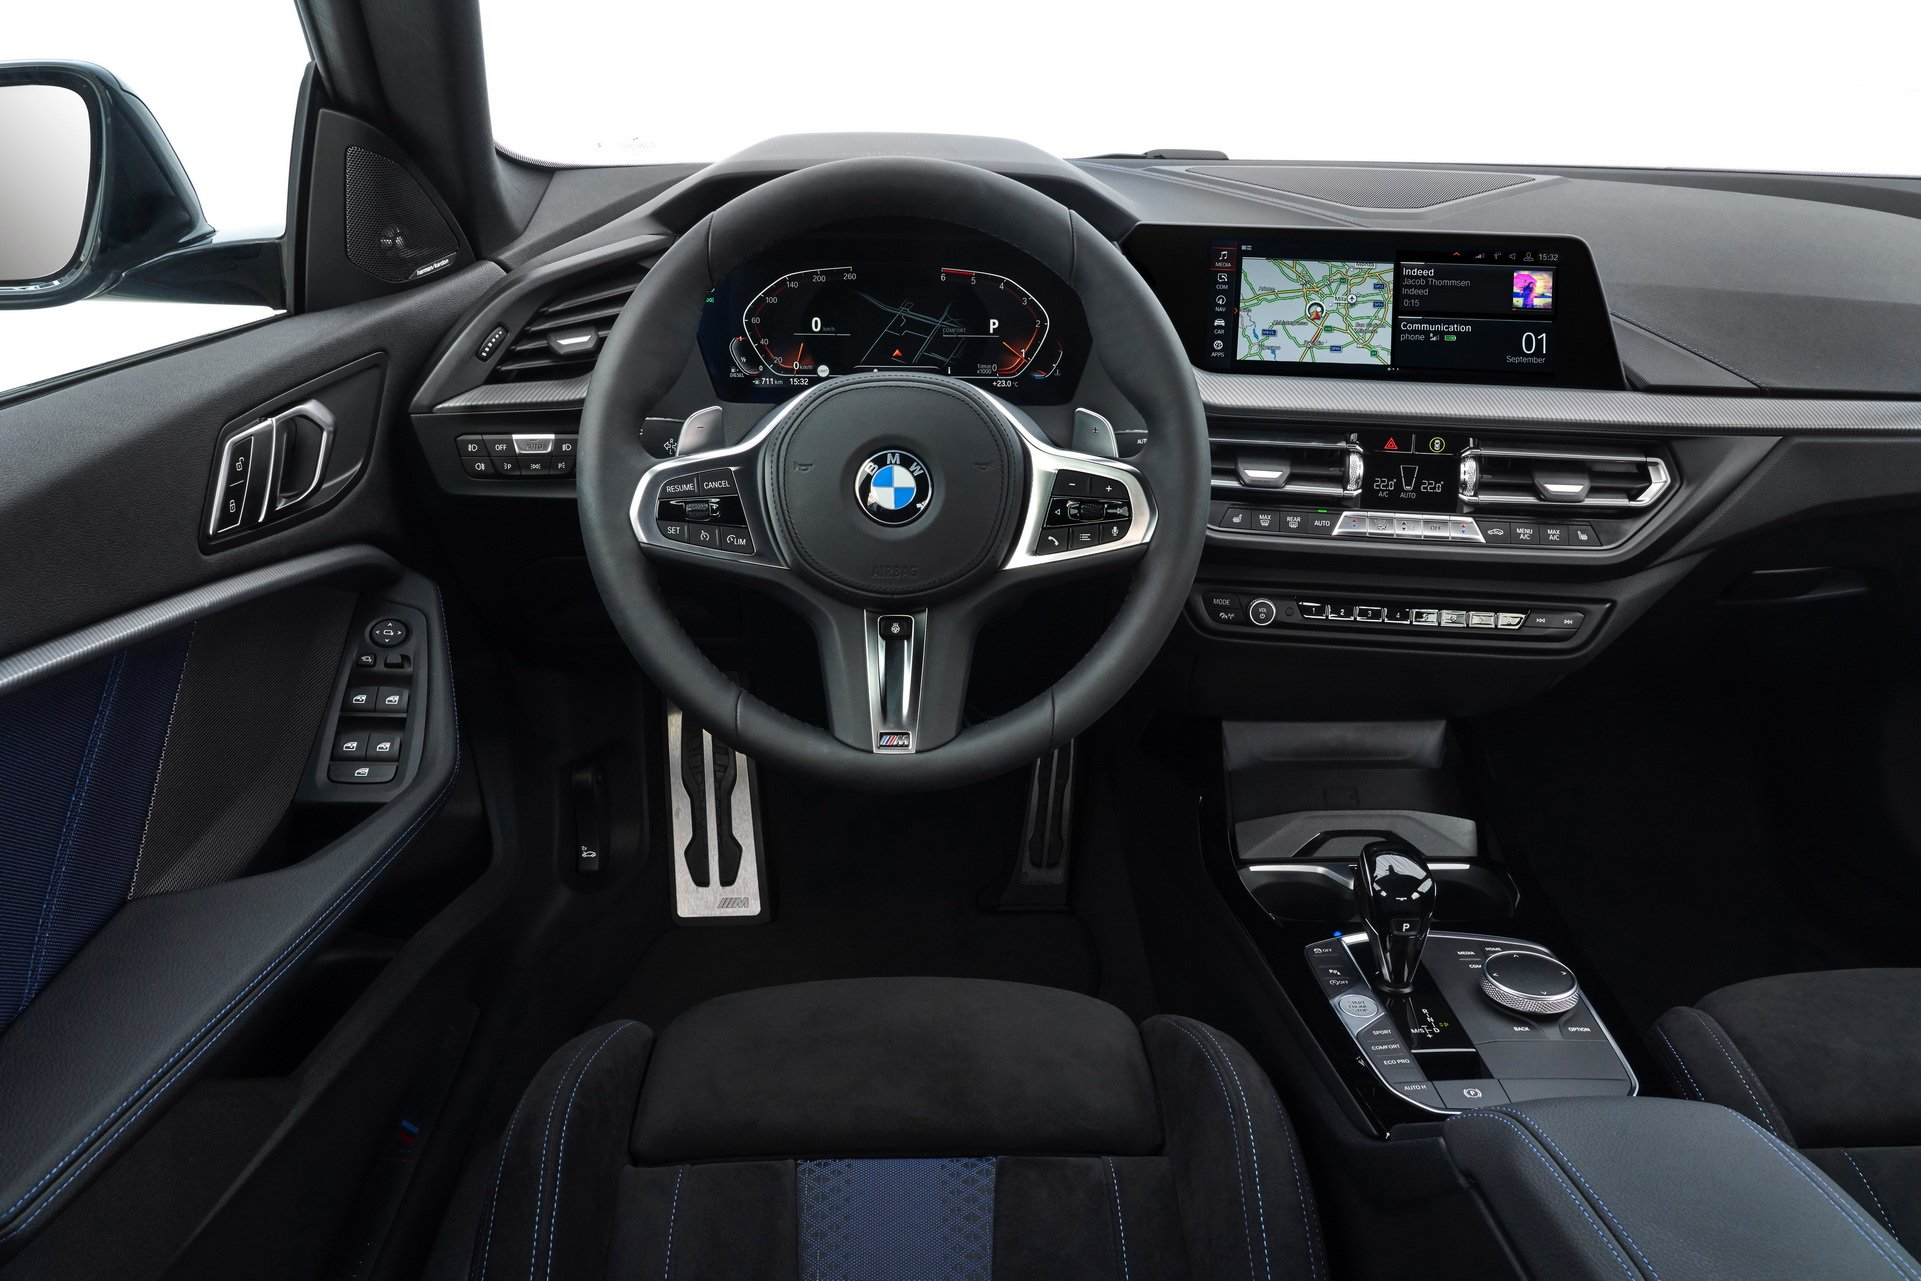 2020-bmw-2-series-gran-coupe-4.jpg